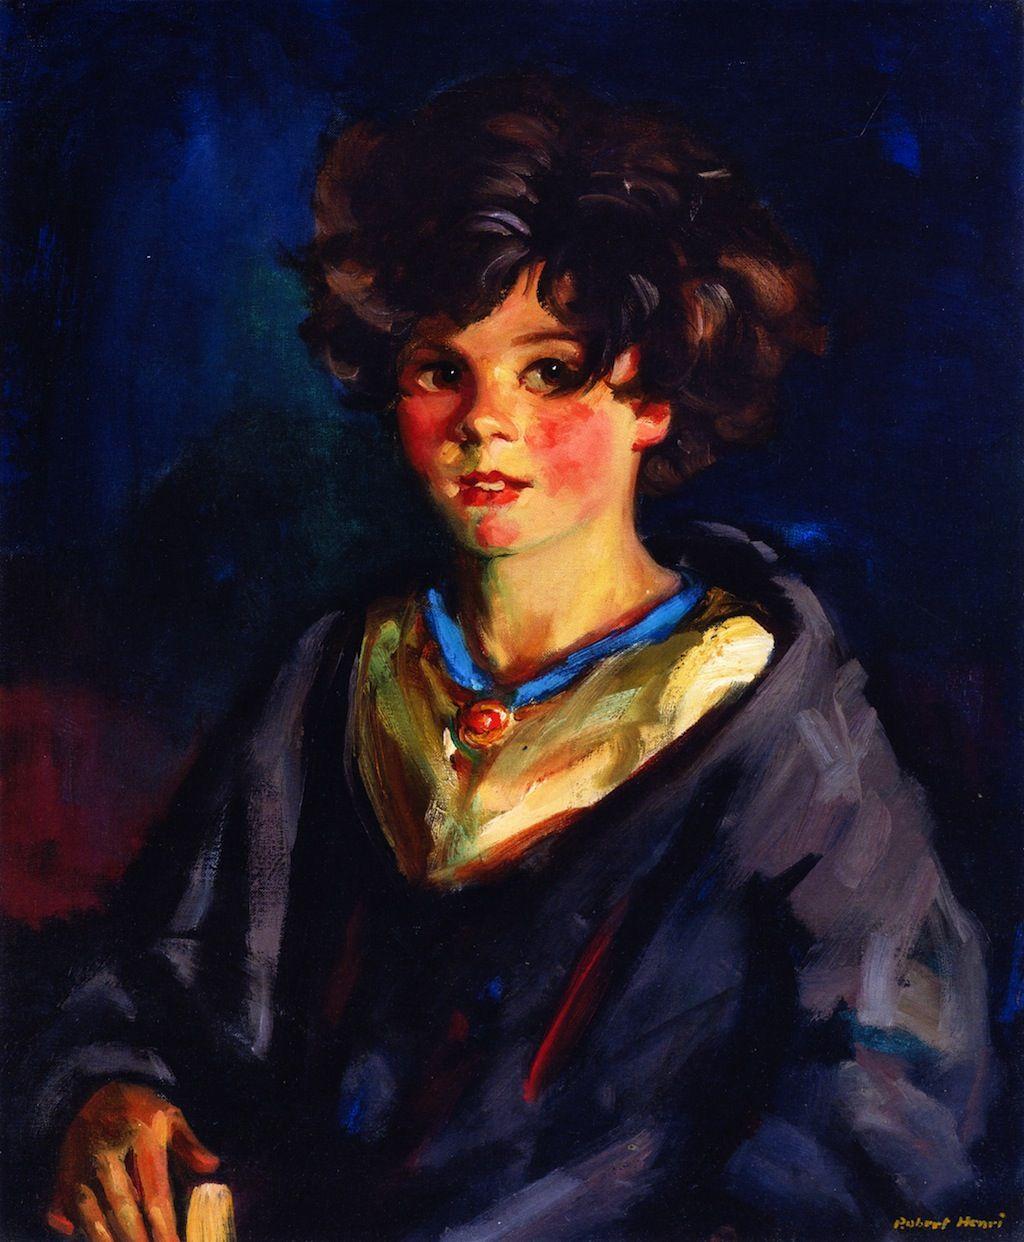 Robert Henri - Annie Beg - 1925